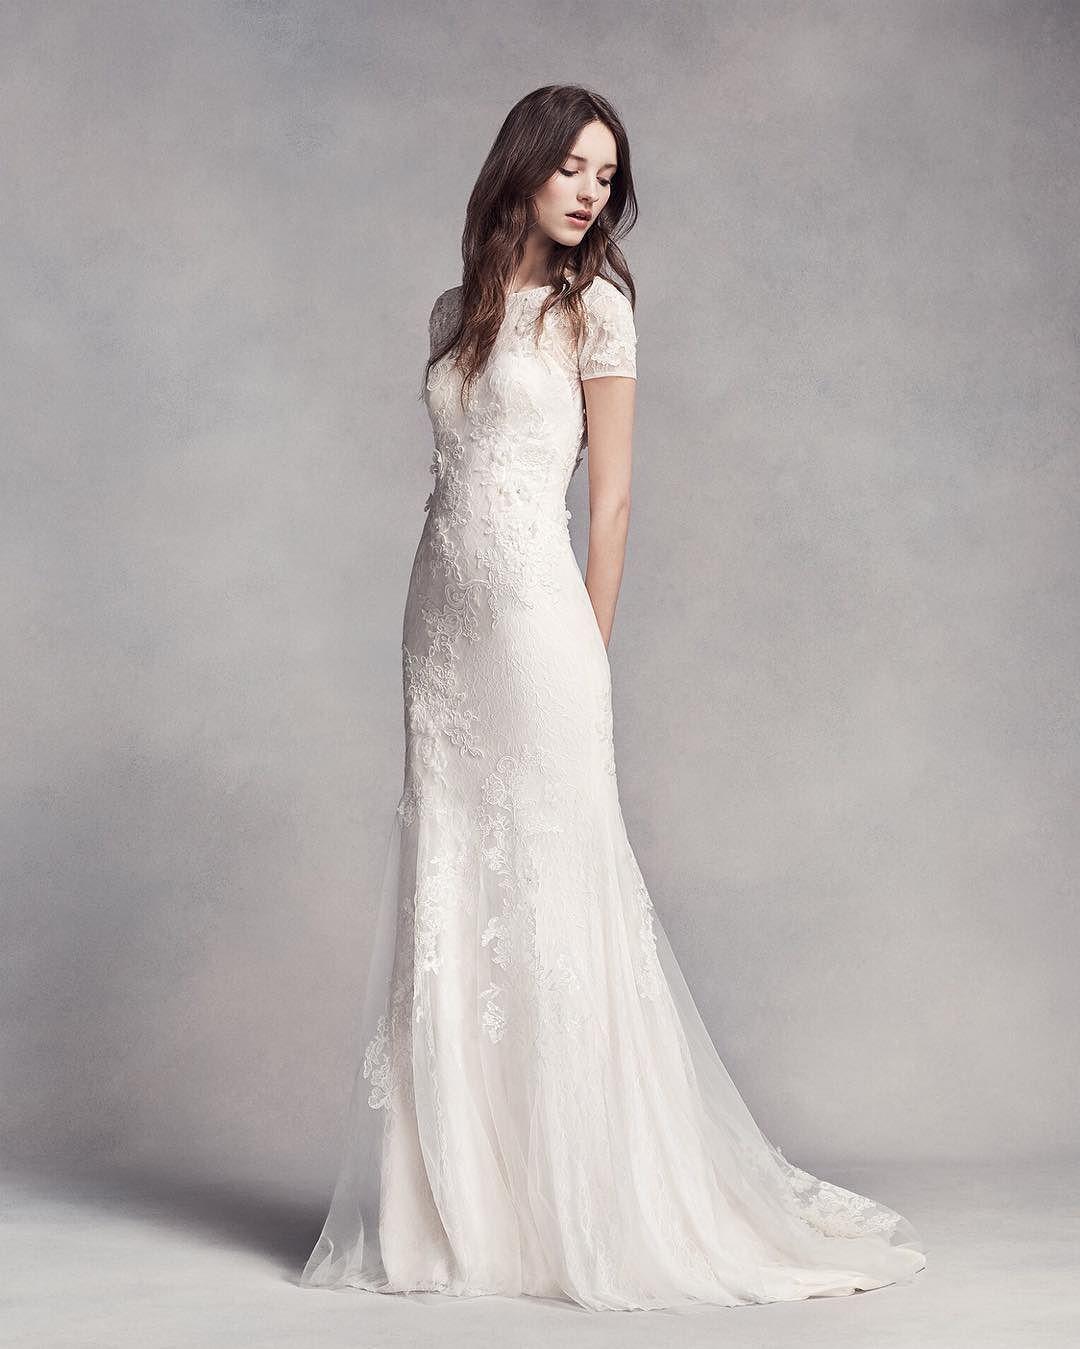 Pin by wedding pictures on wedding dress pinterest wedding dress